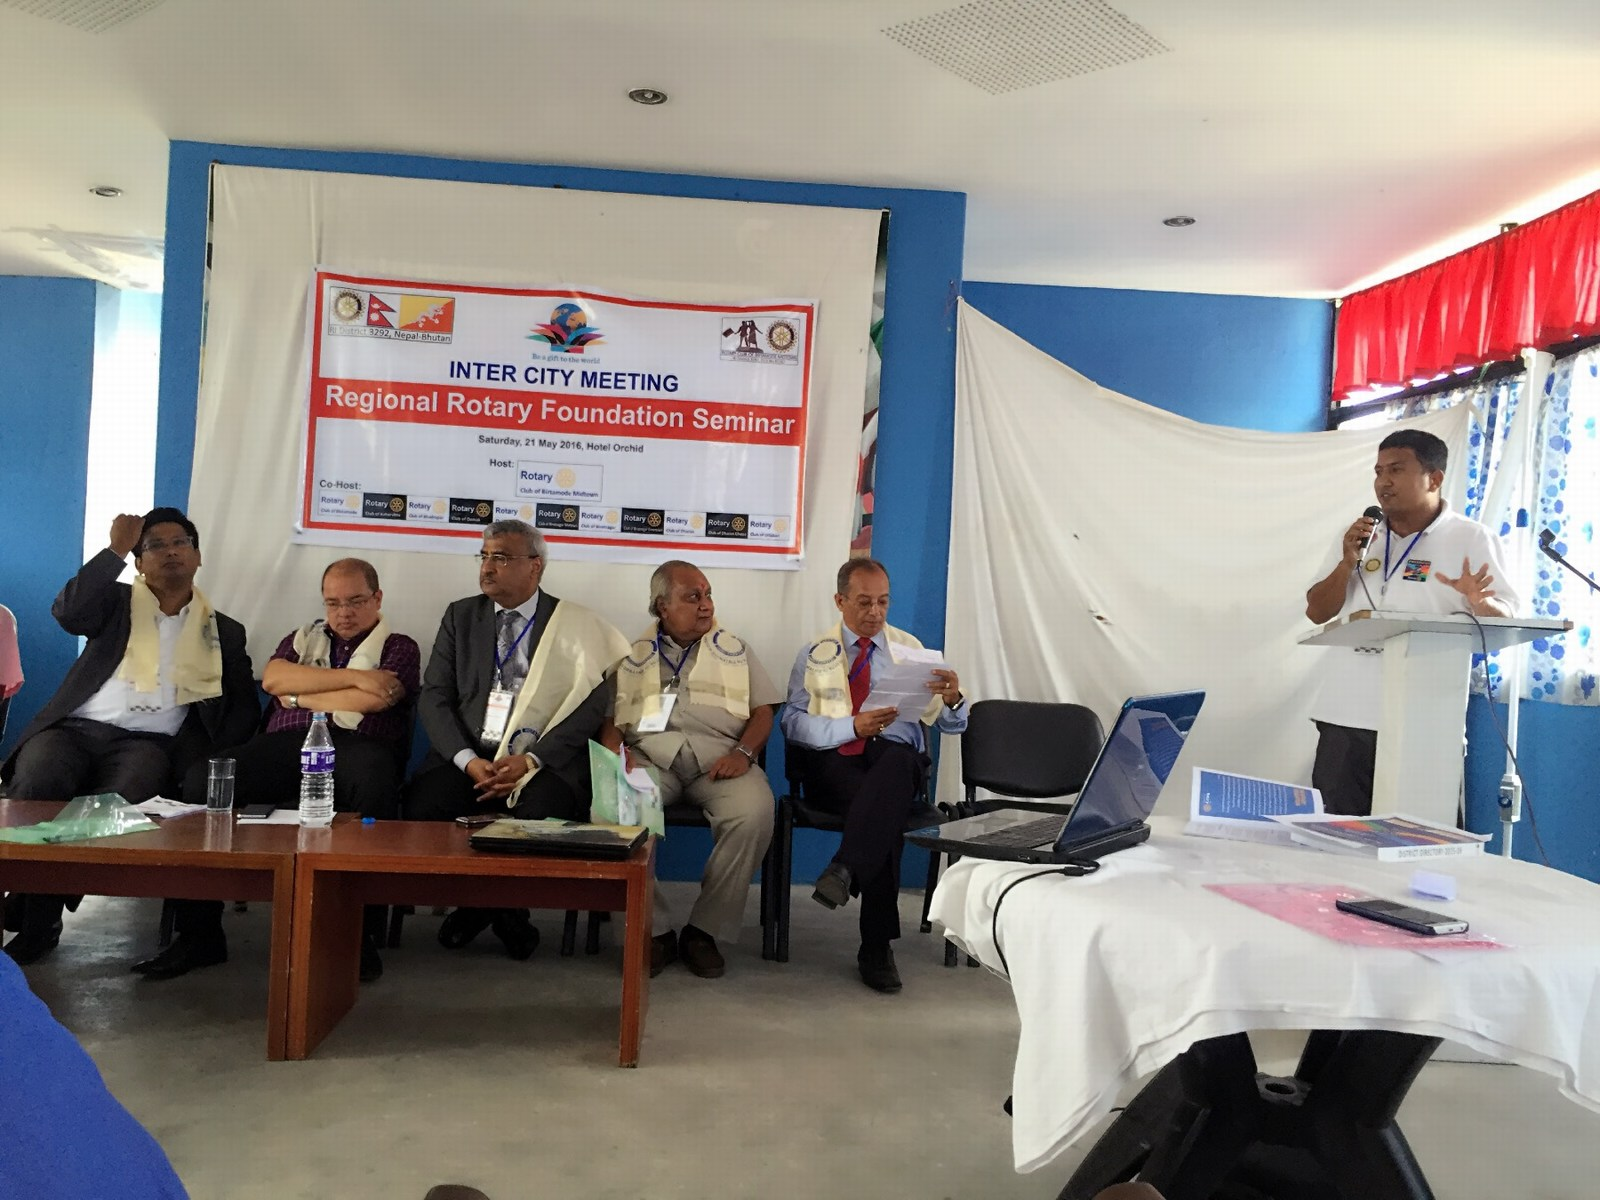 Regional-Rotary-Foundation-Seminar-Intercity-Meeting-Rotary-Club-of-Kakarvitta-2